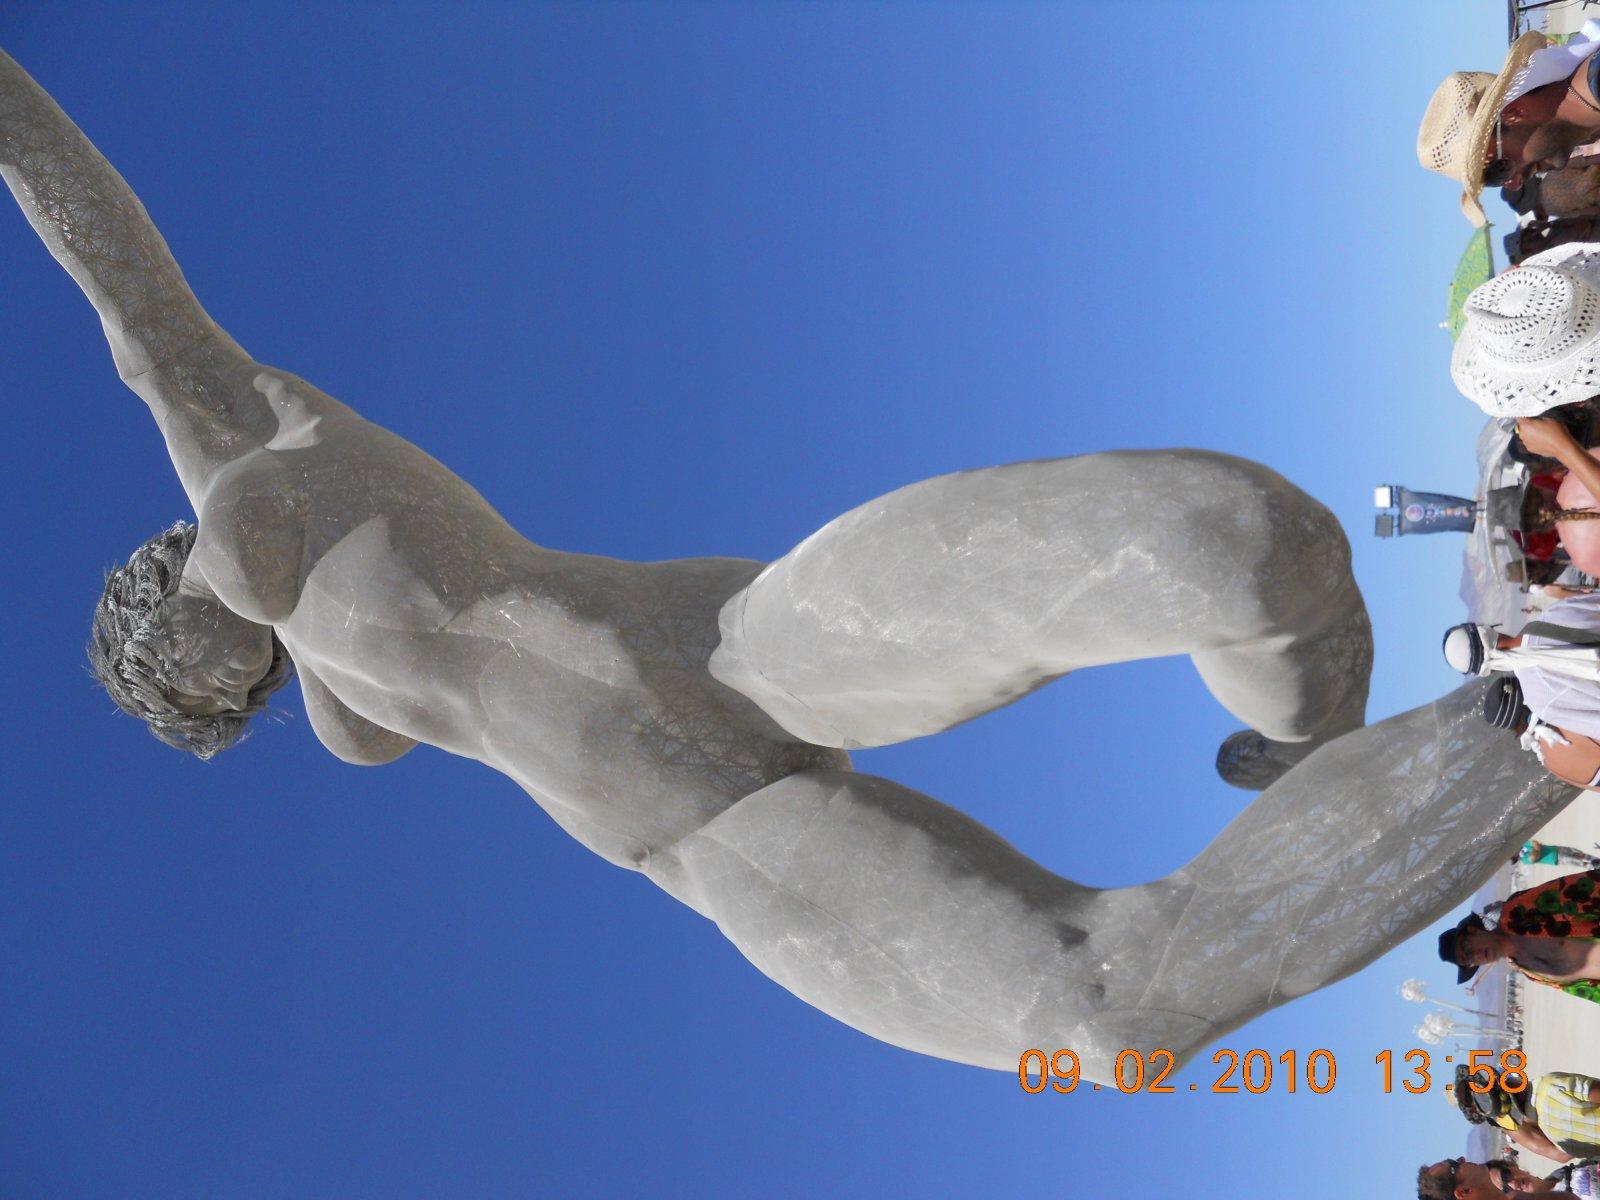 Click image for larger version  Name:DSCN1706.jpg Views:79 Size:192.7 KB ID:110840